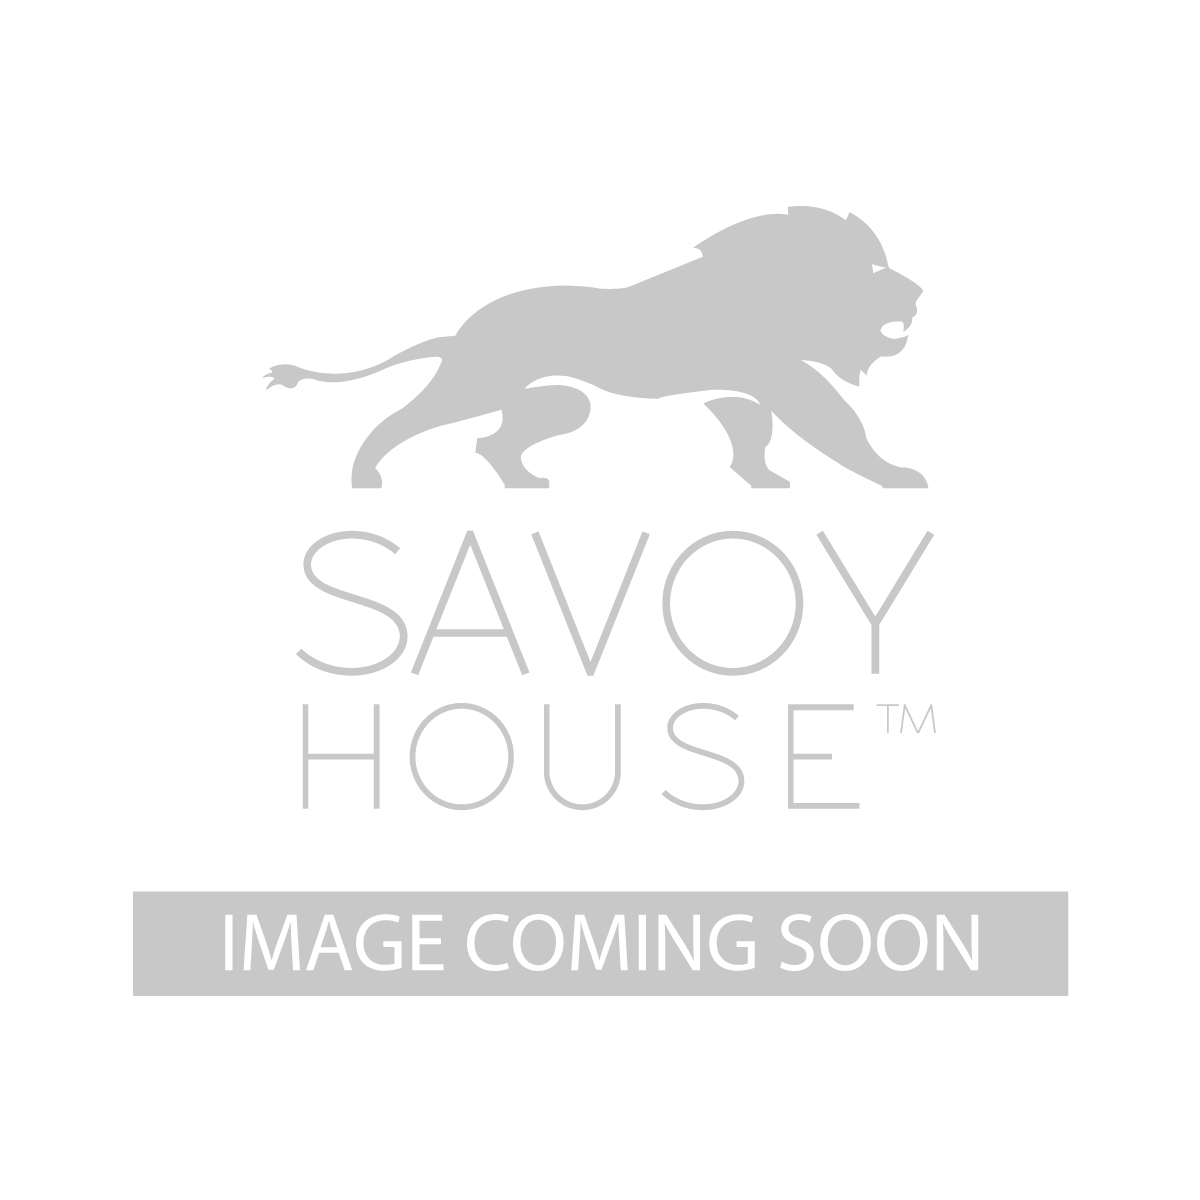 3 light pendant industrial akron light pendant 79006313 by savoy house